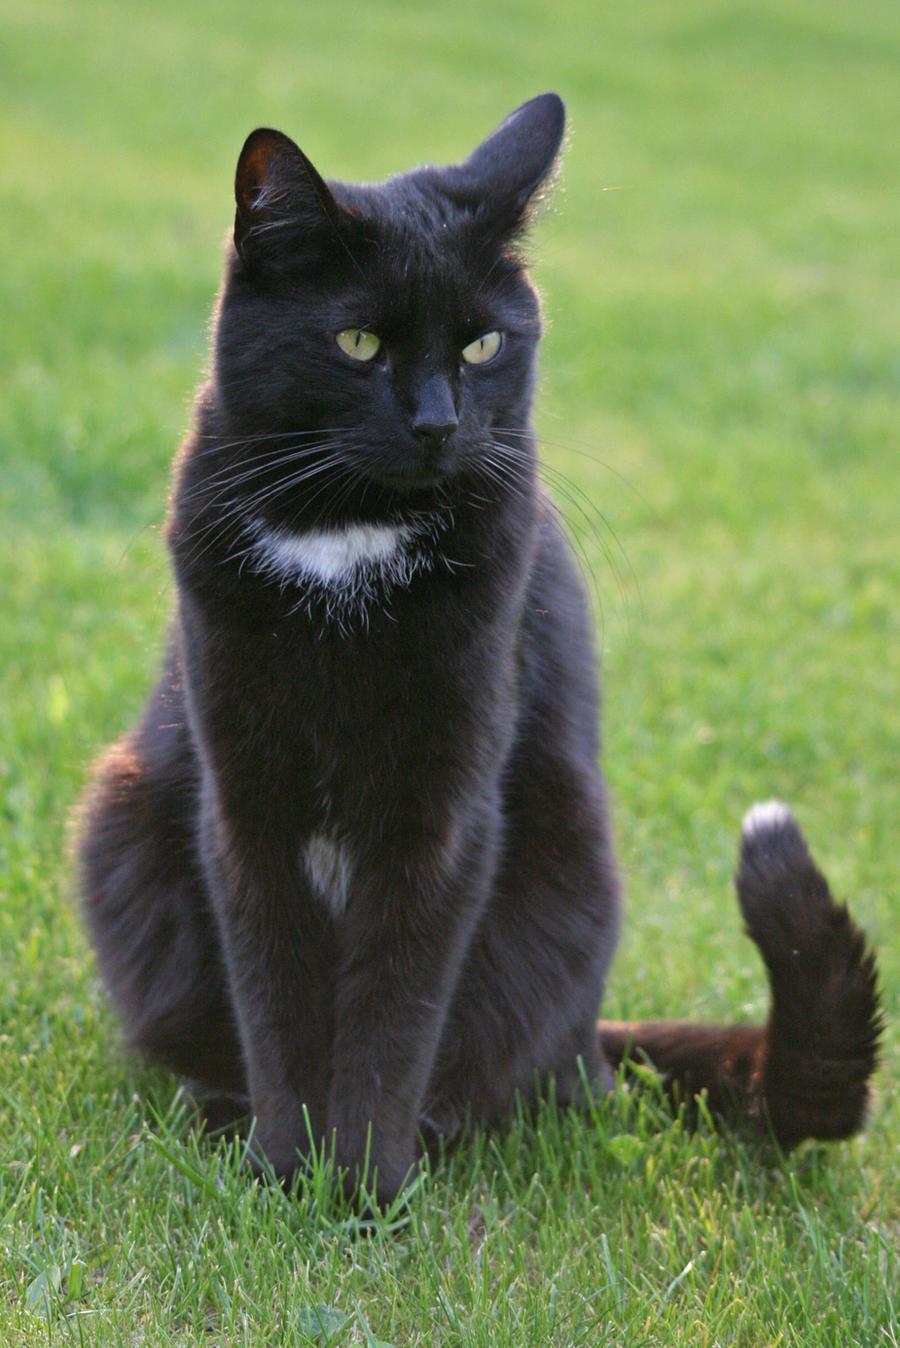 Cat 01 by CorneredRing-Stock